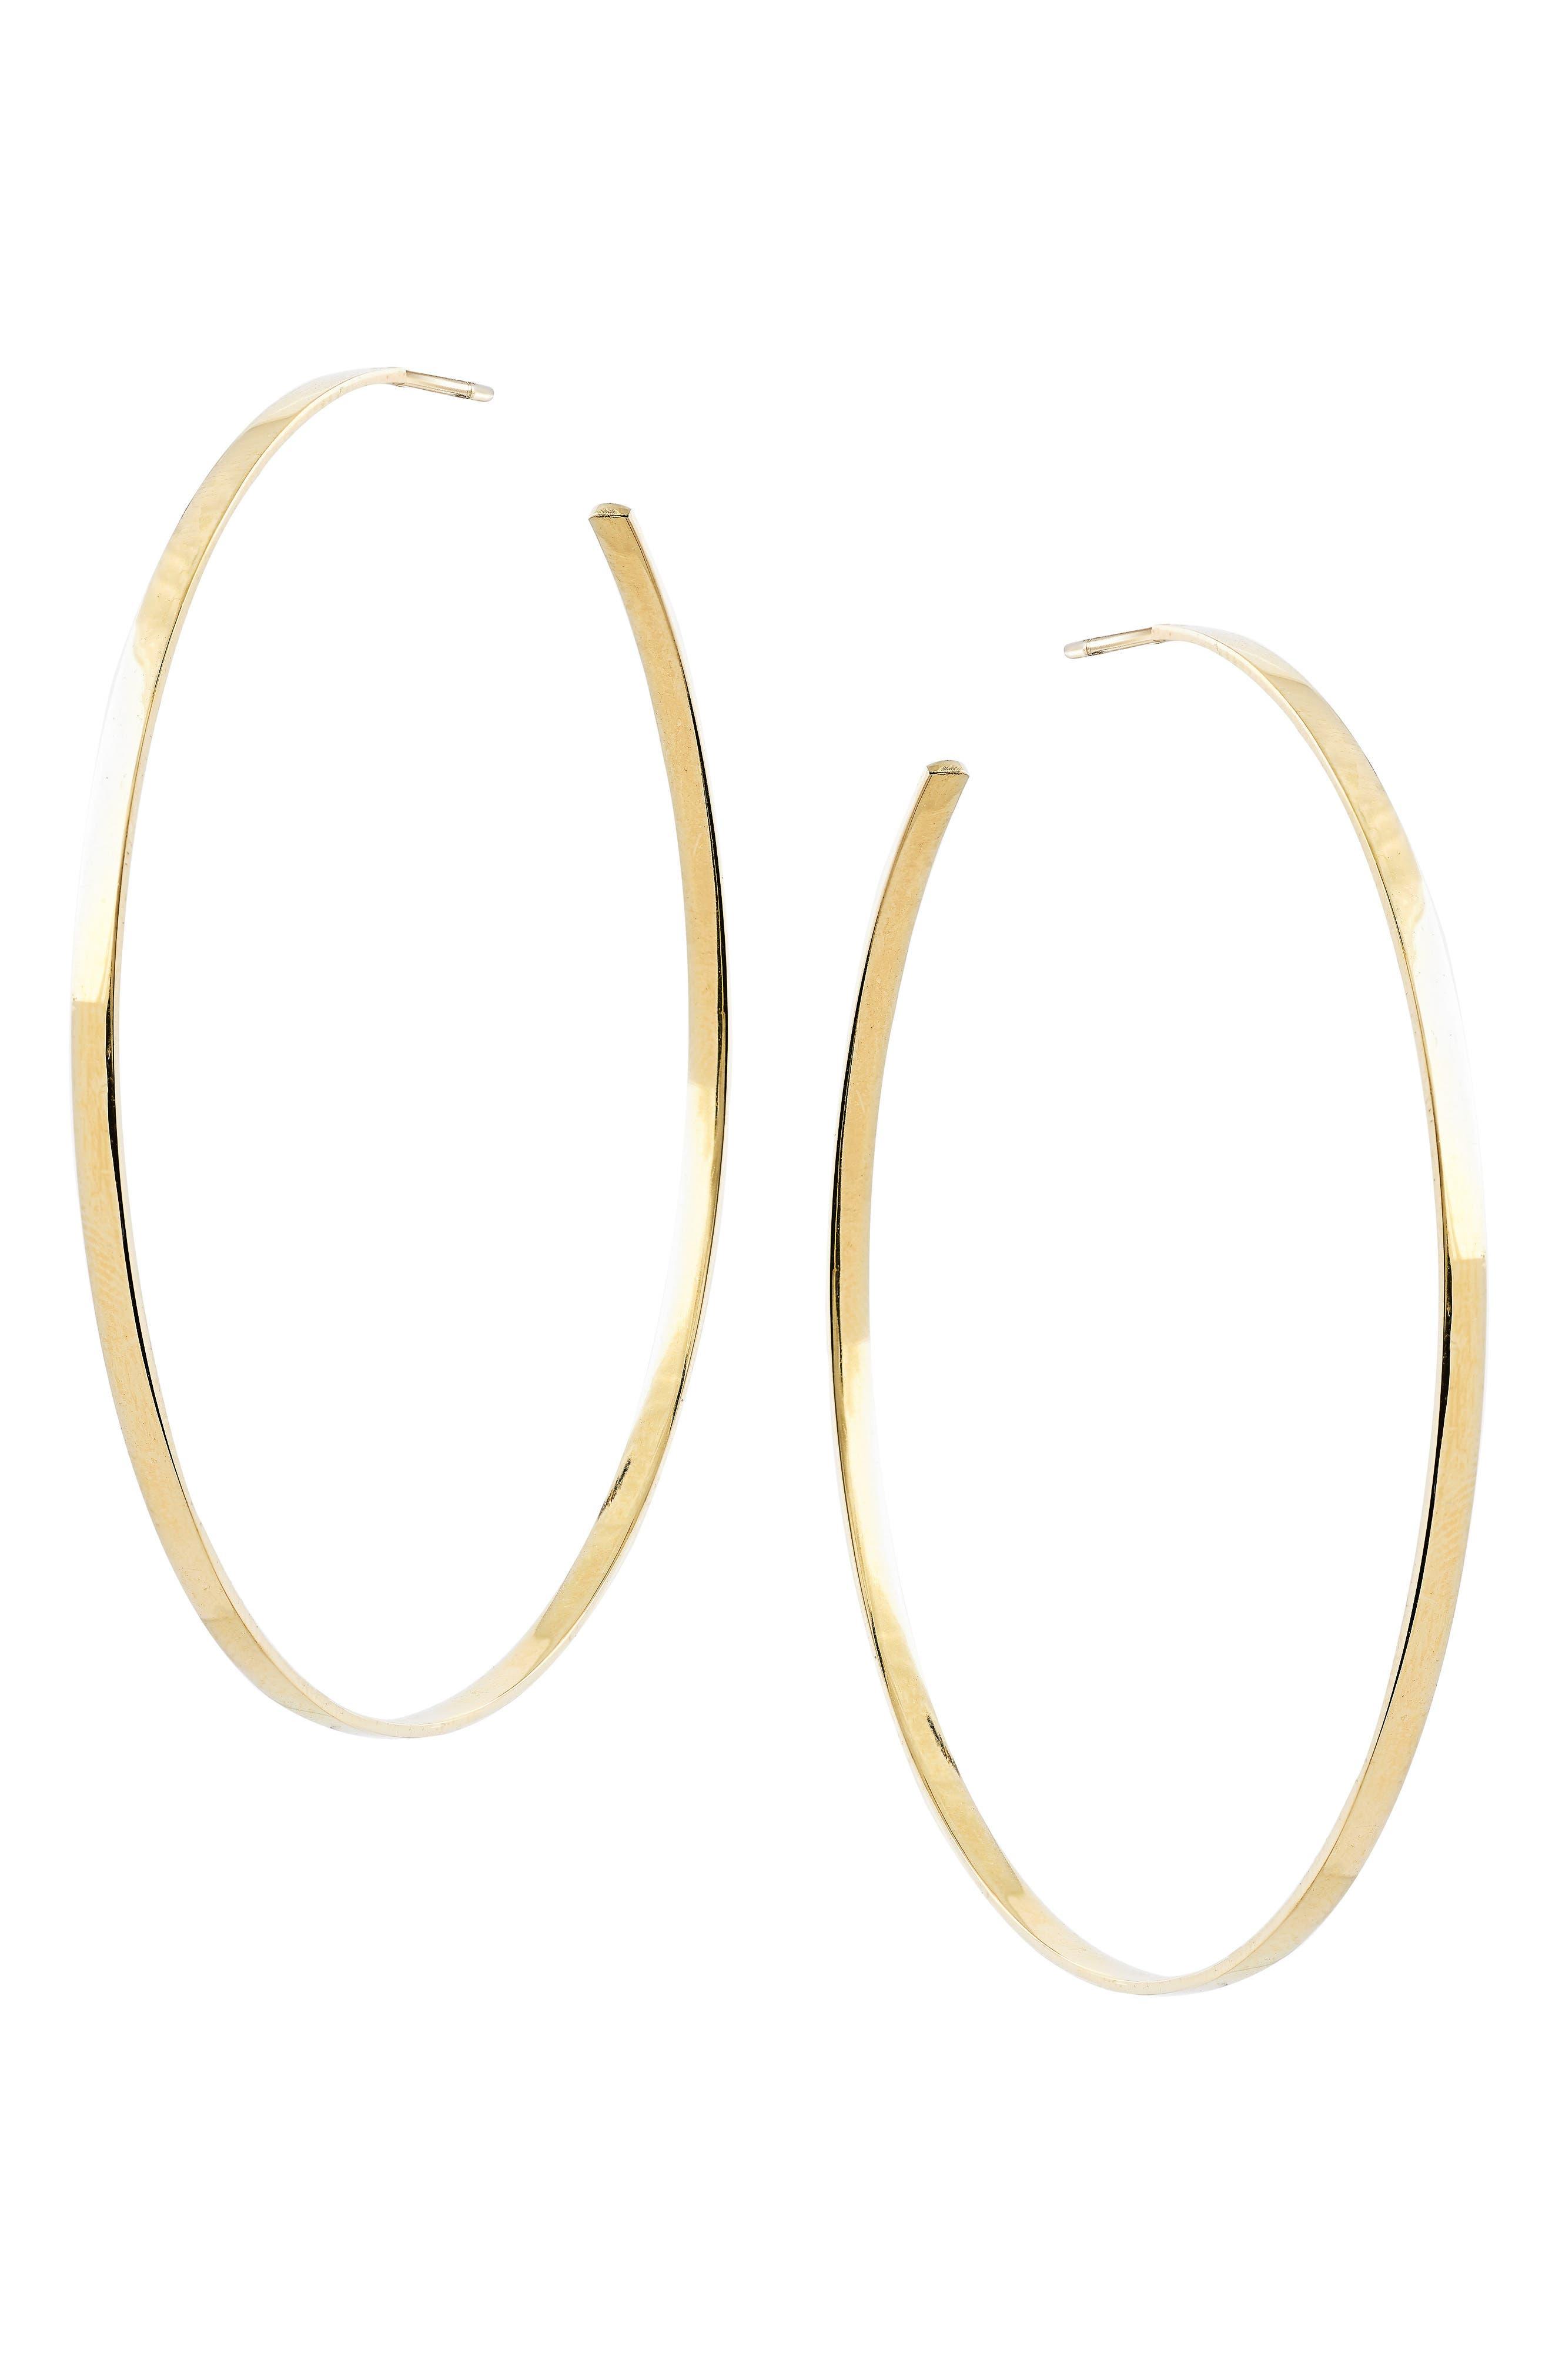 LANA JEWELRY,                             Sunrise Hoop Earrings,                             Main thumbnail 1, color,                             YELLOW GOLD